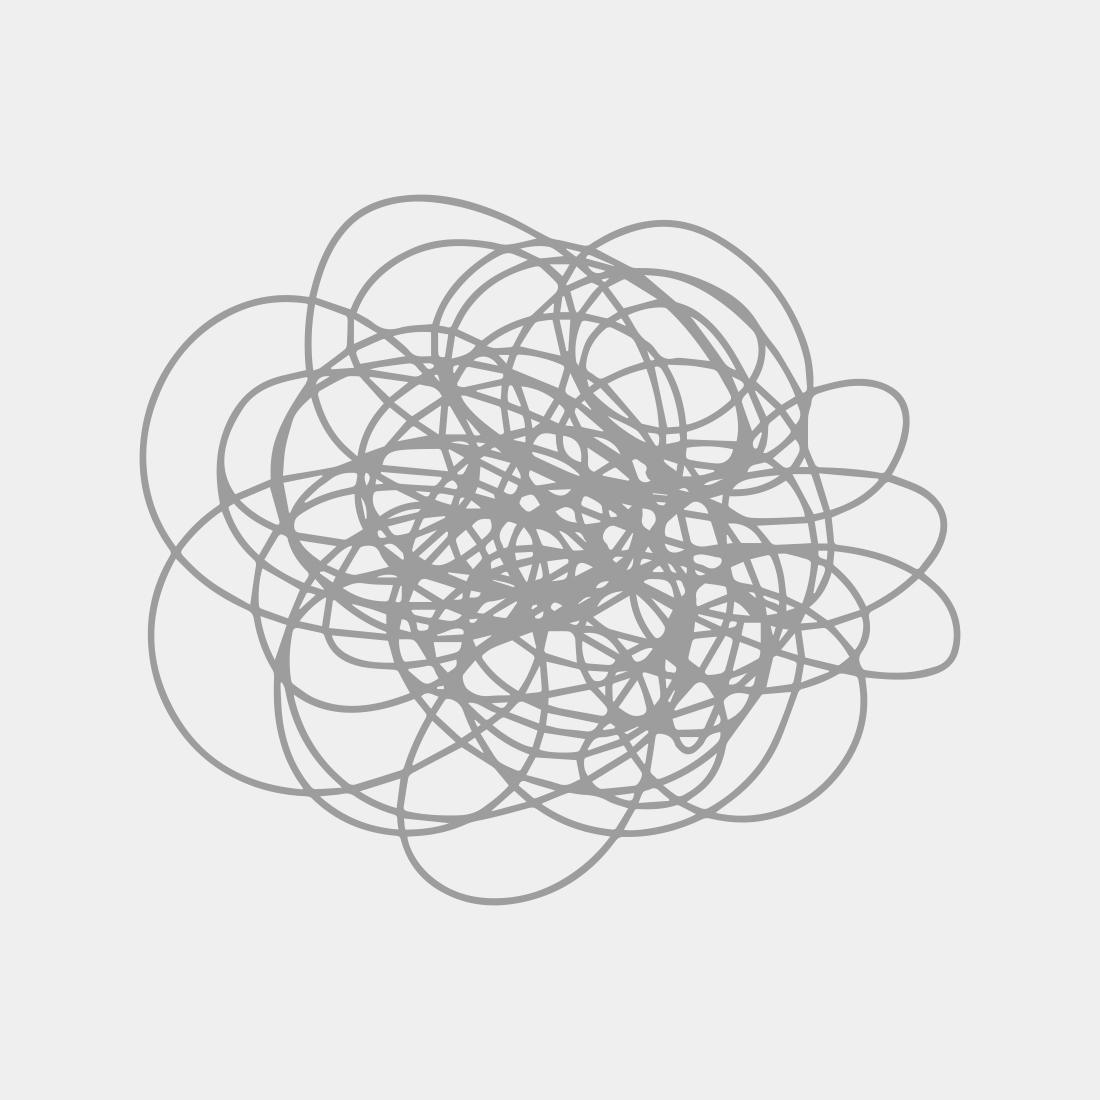 Cornelia Parker Transitional Object (Psychobarn)